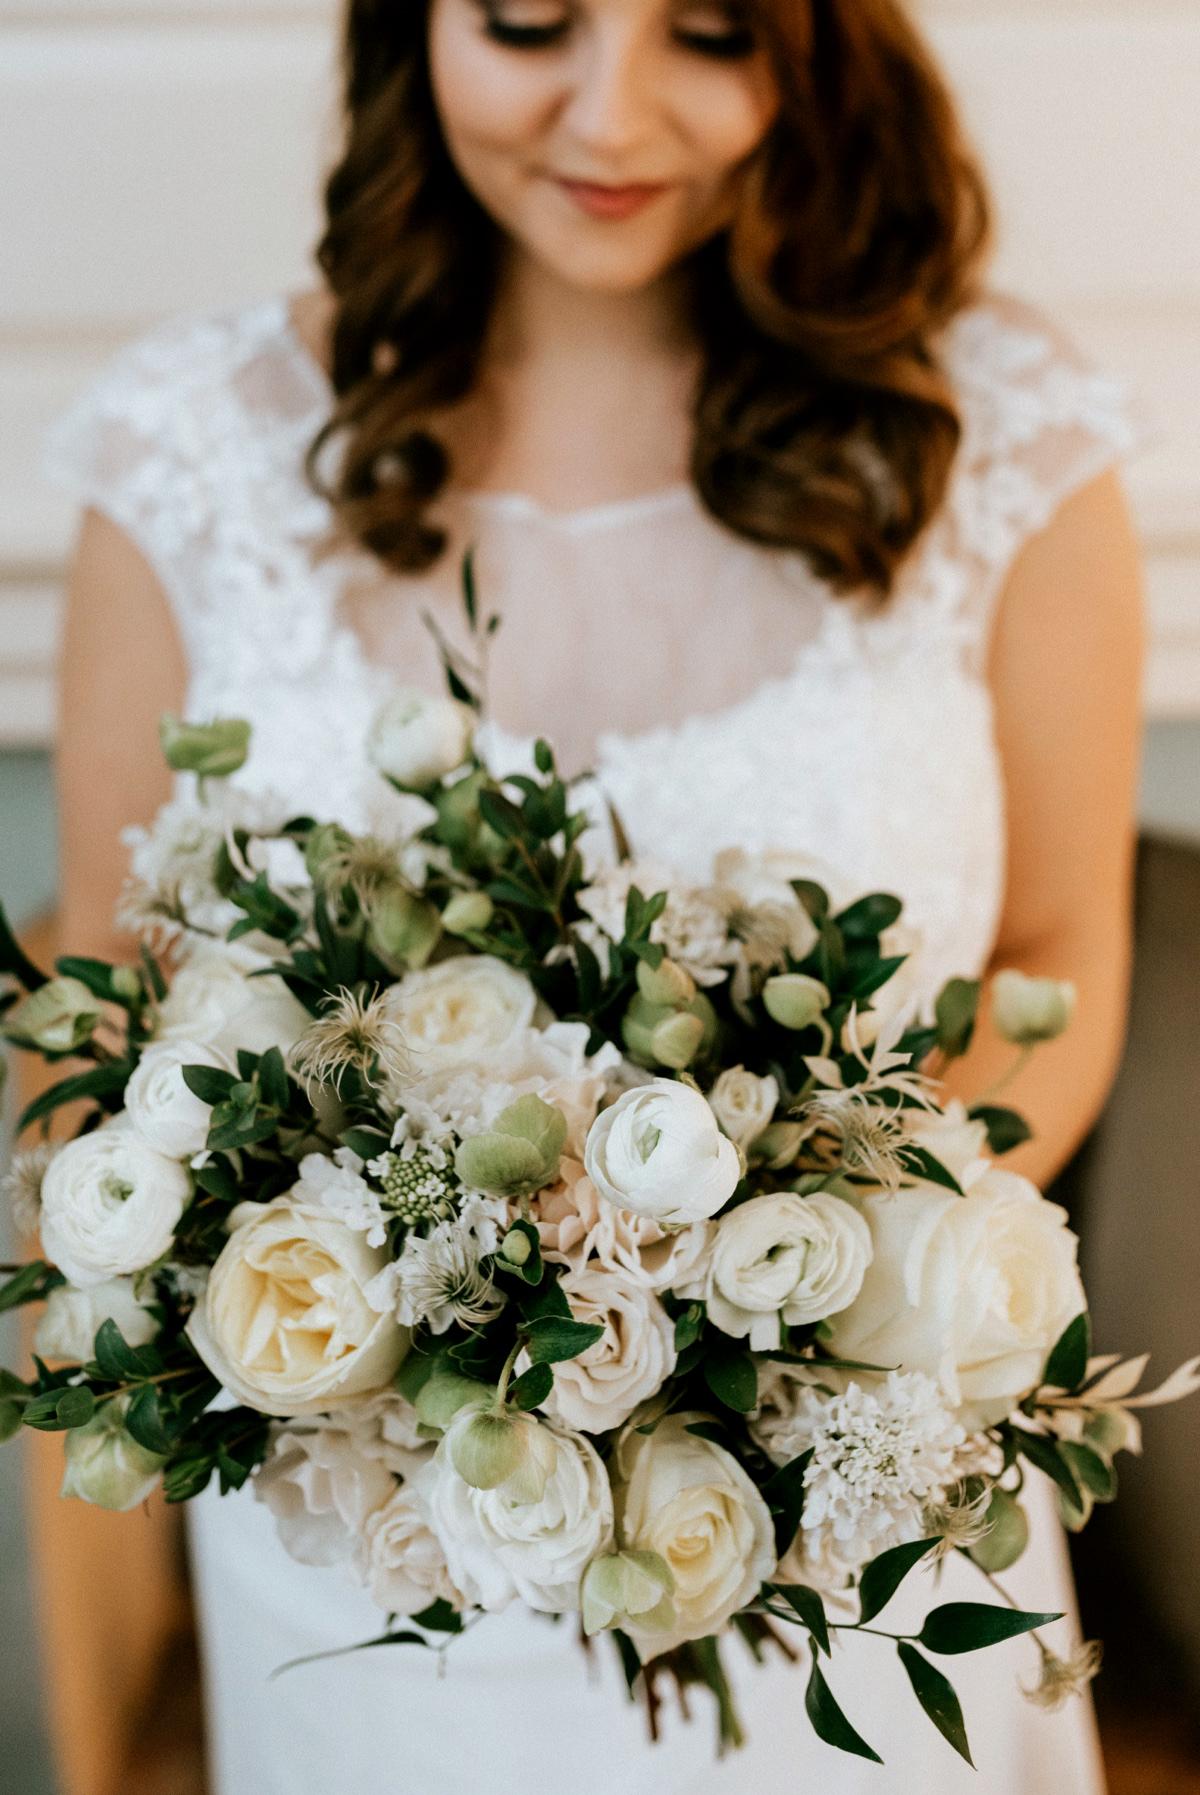 10 The Inn At Glencairn Winter Wedding Inspiration Winter Elopement Princeton Wedding Photographer NJ Wedding Photographer